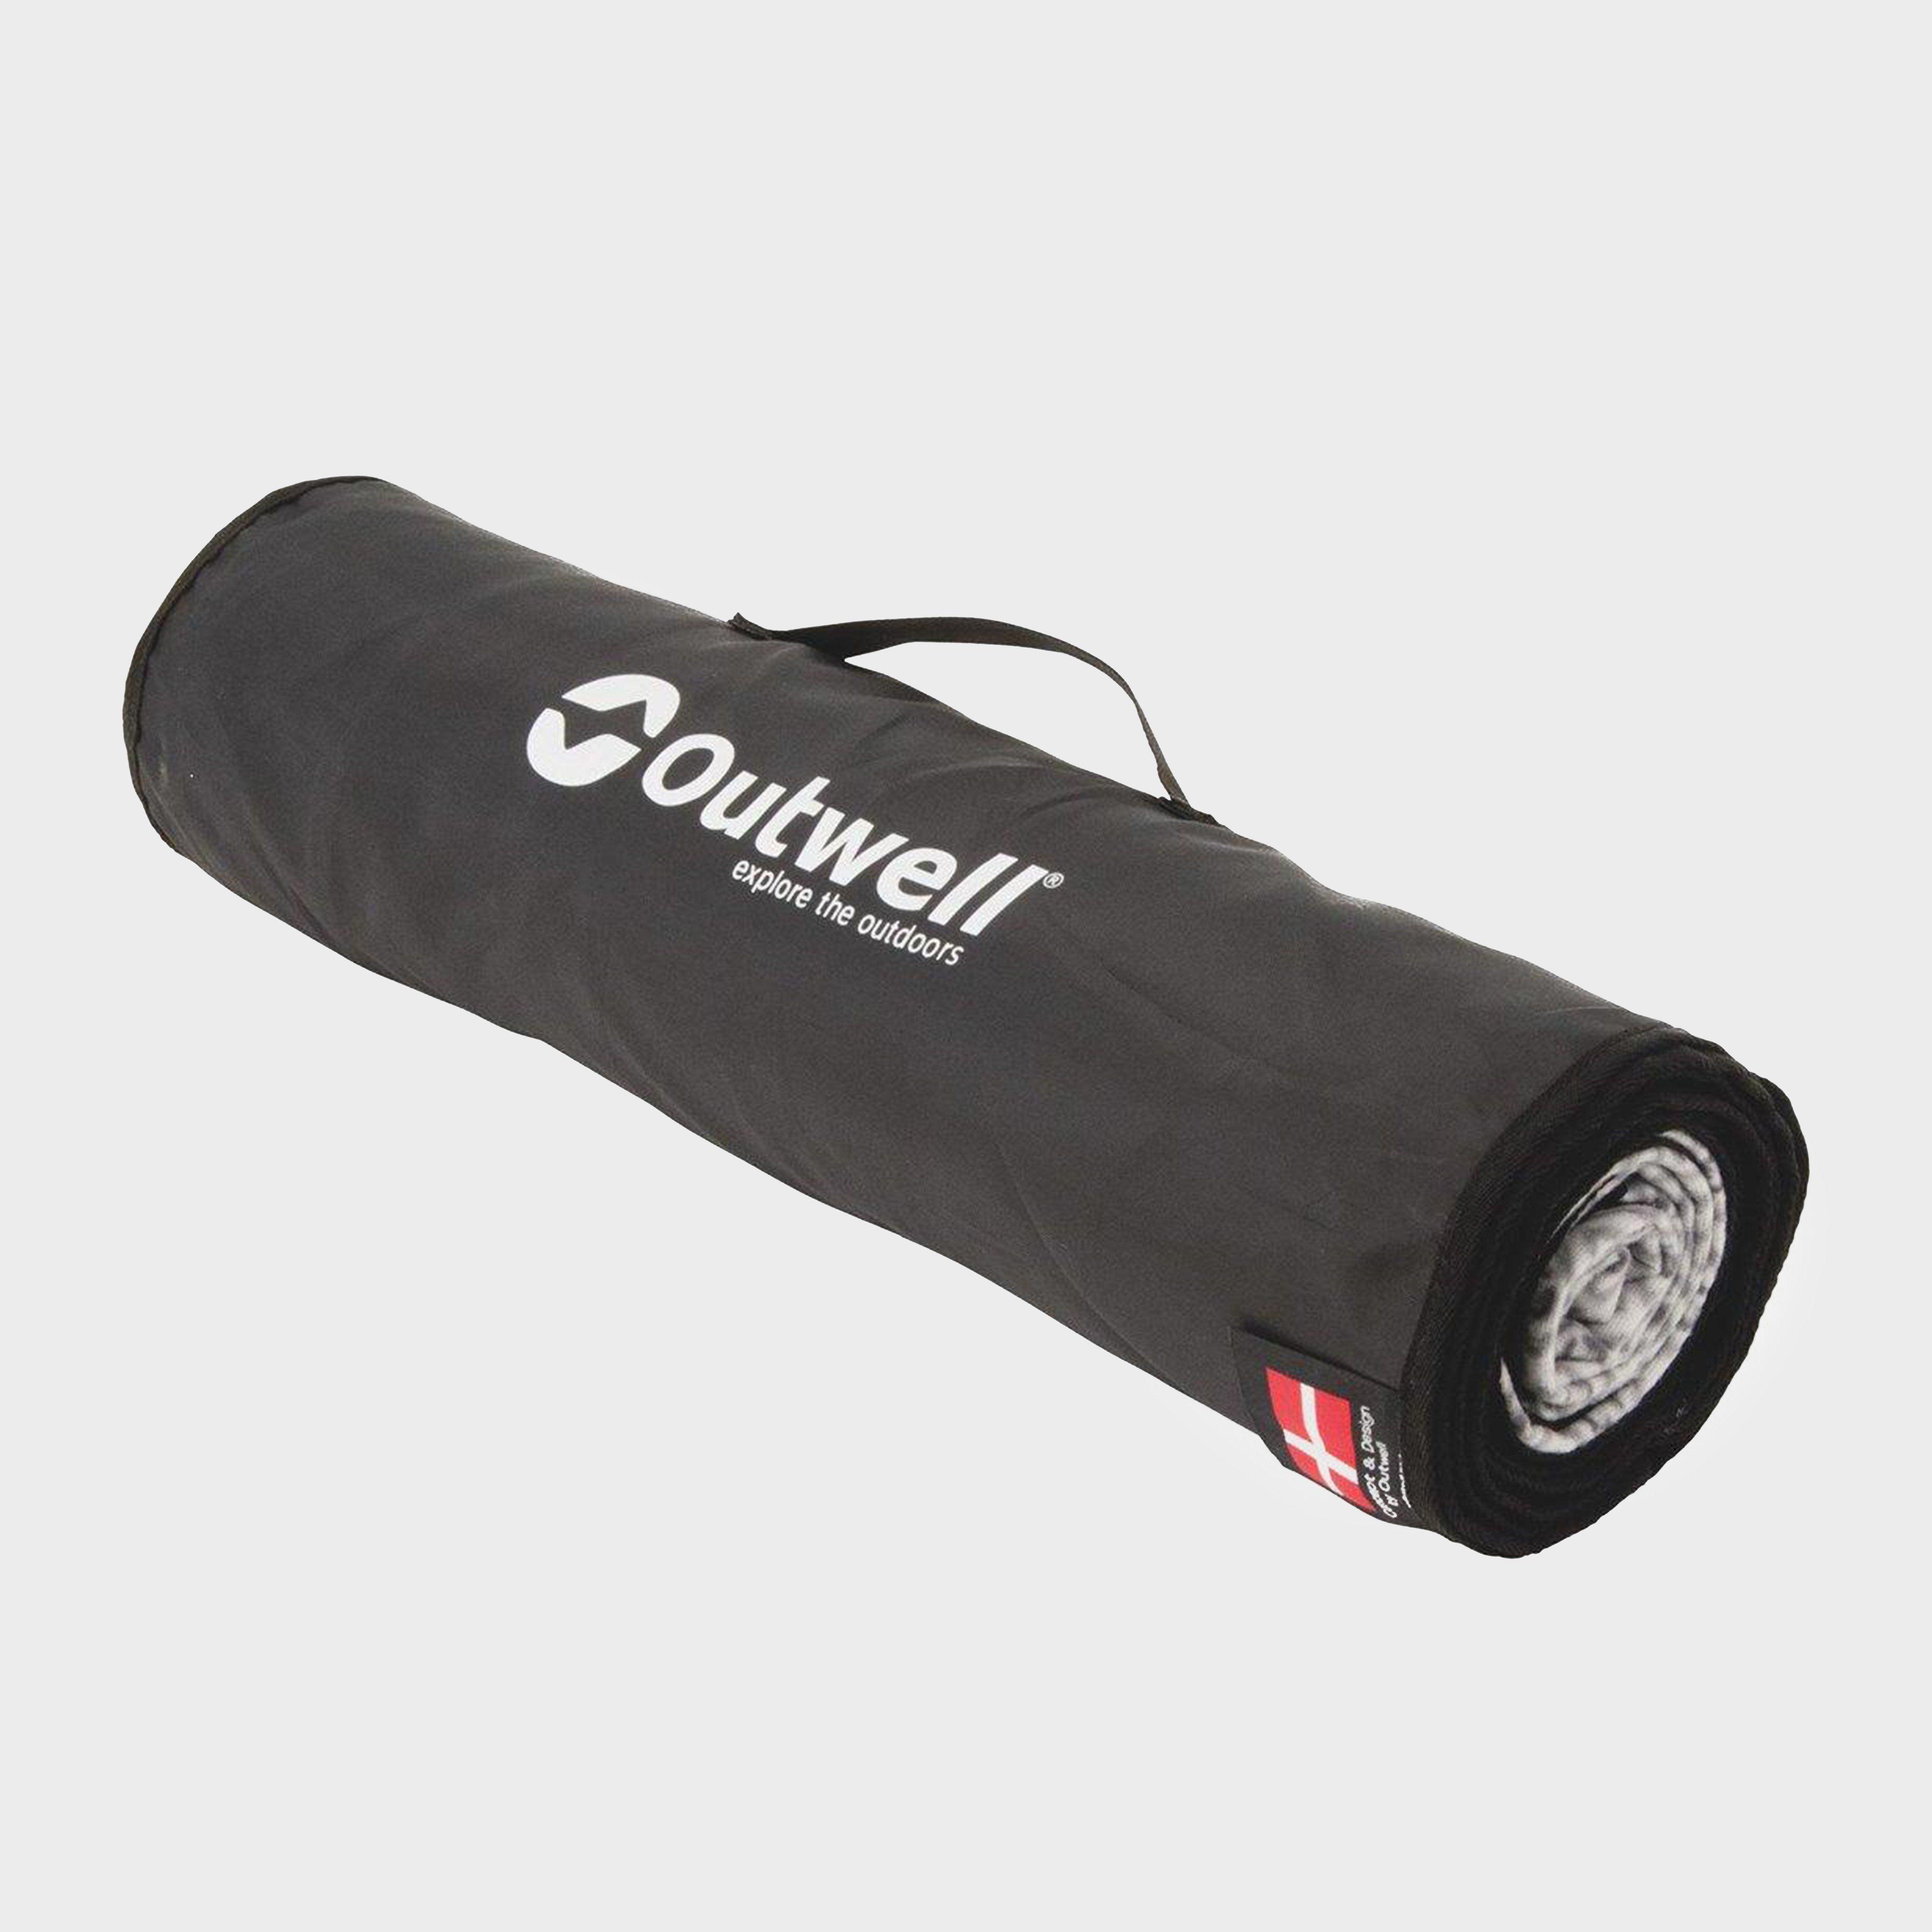 OUTWELL Corvette 7AC Tent Carpet